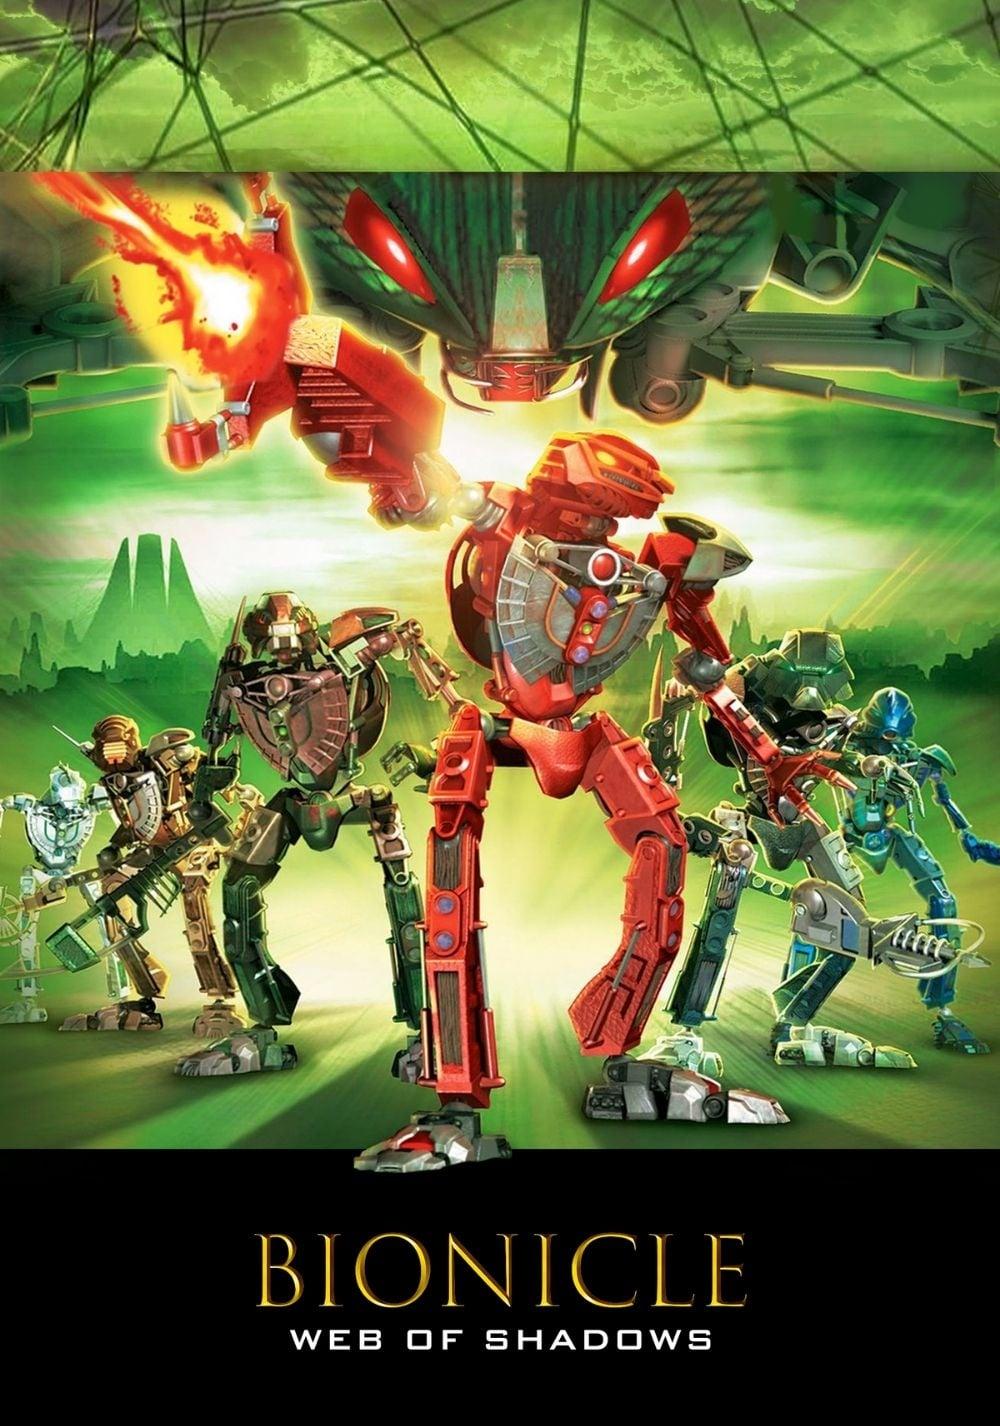 Bionicle 3 Teia de Sombras